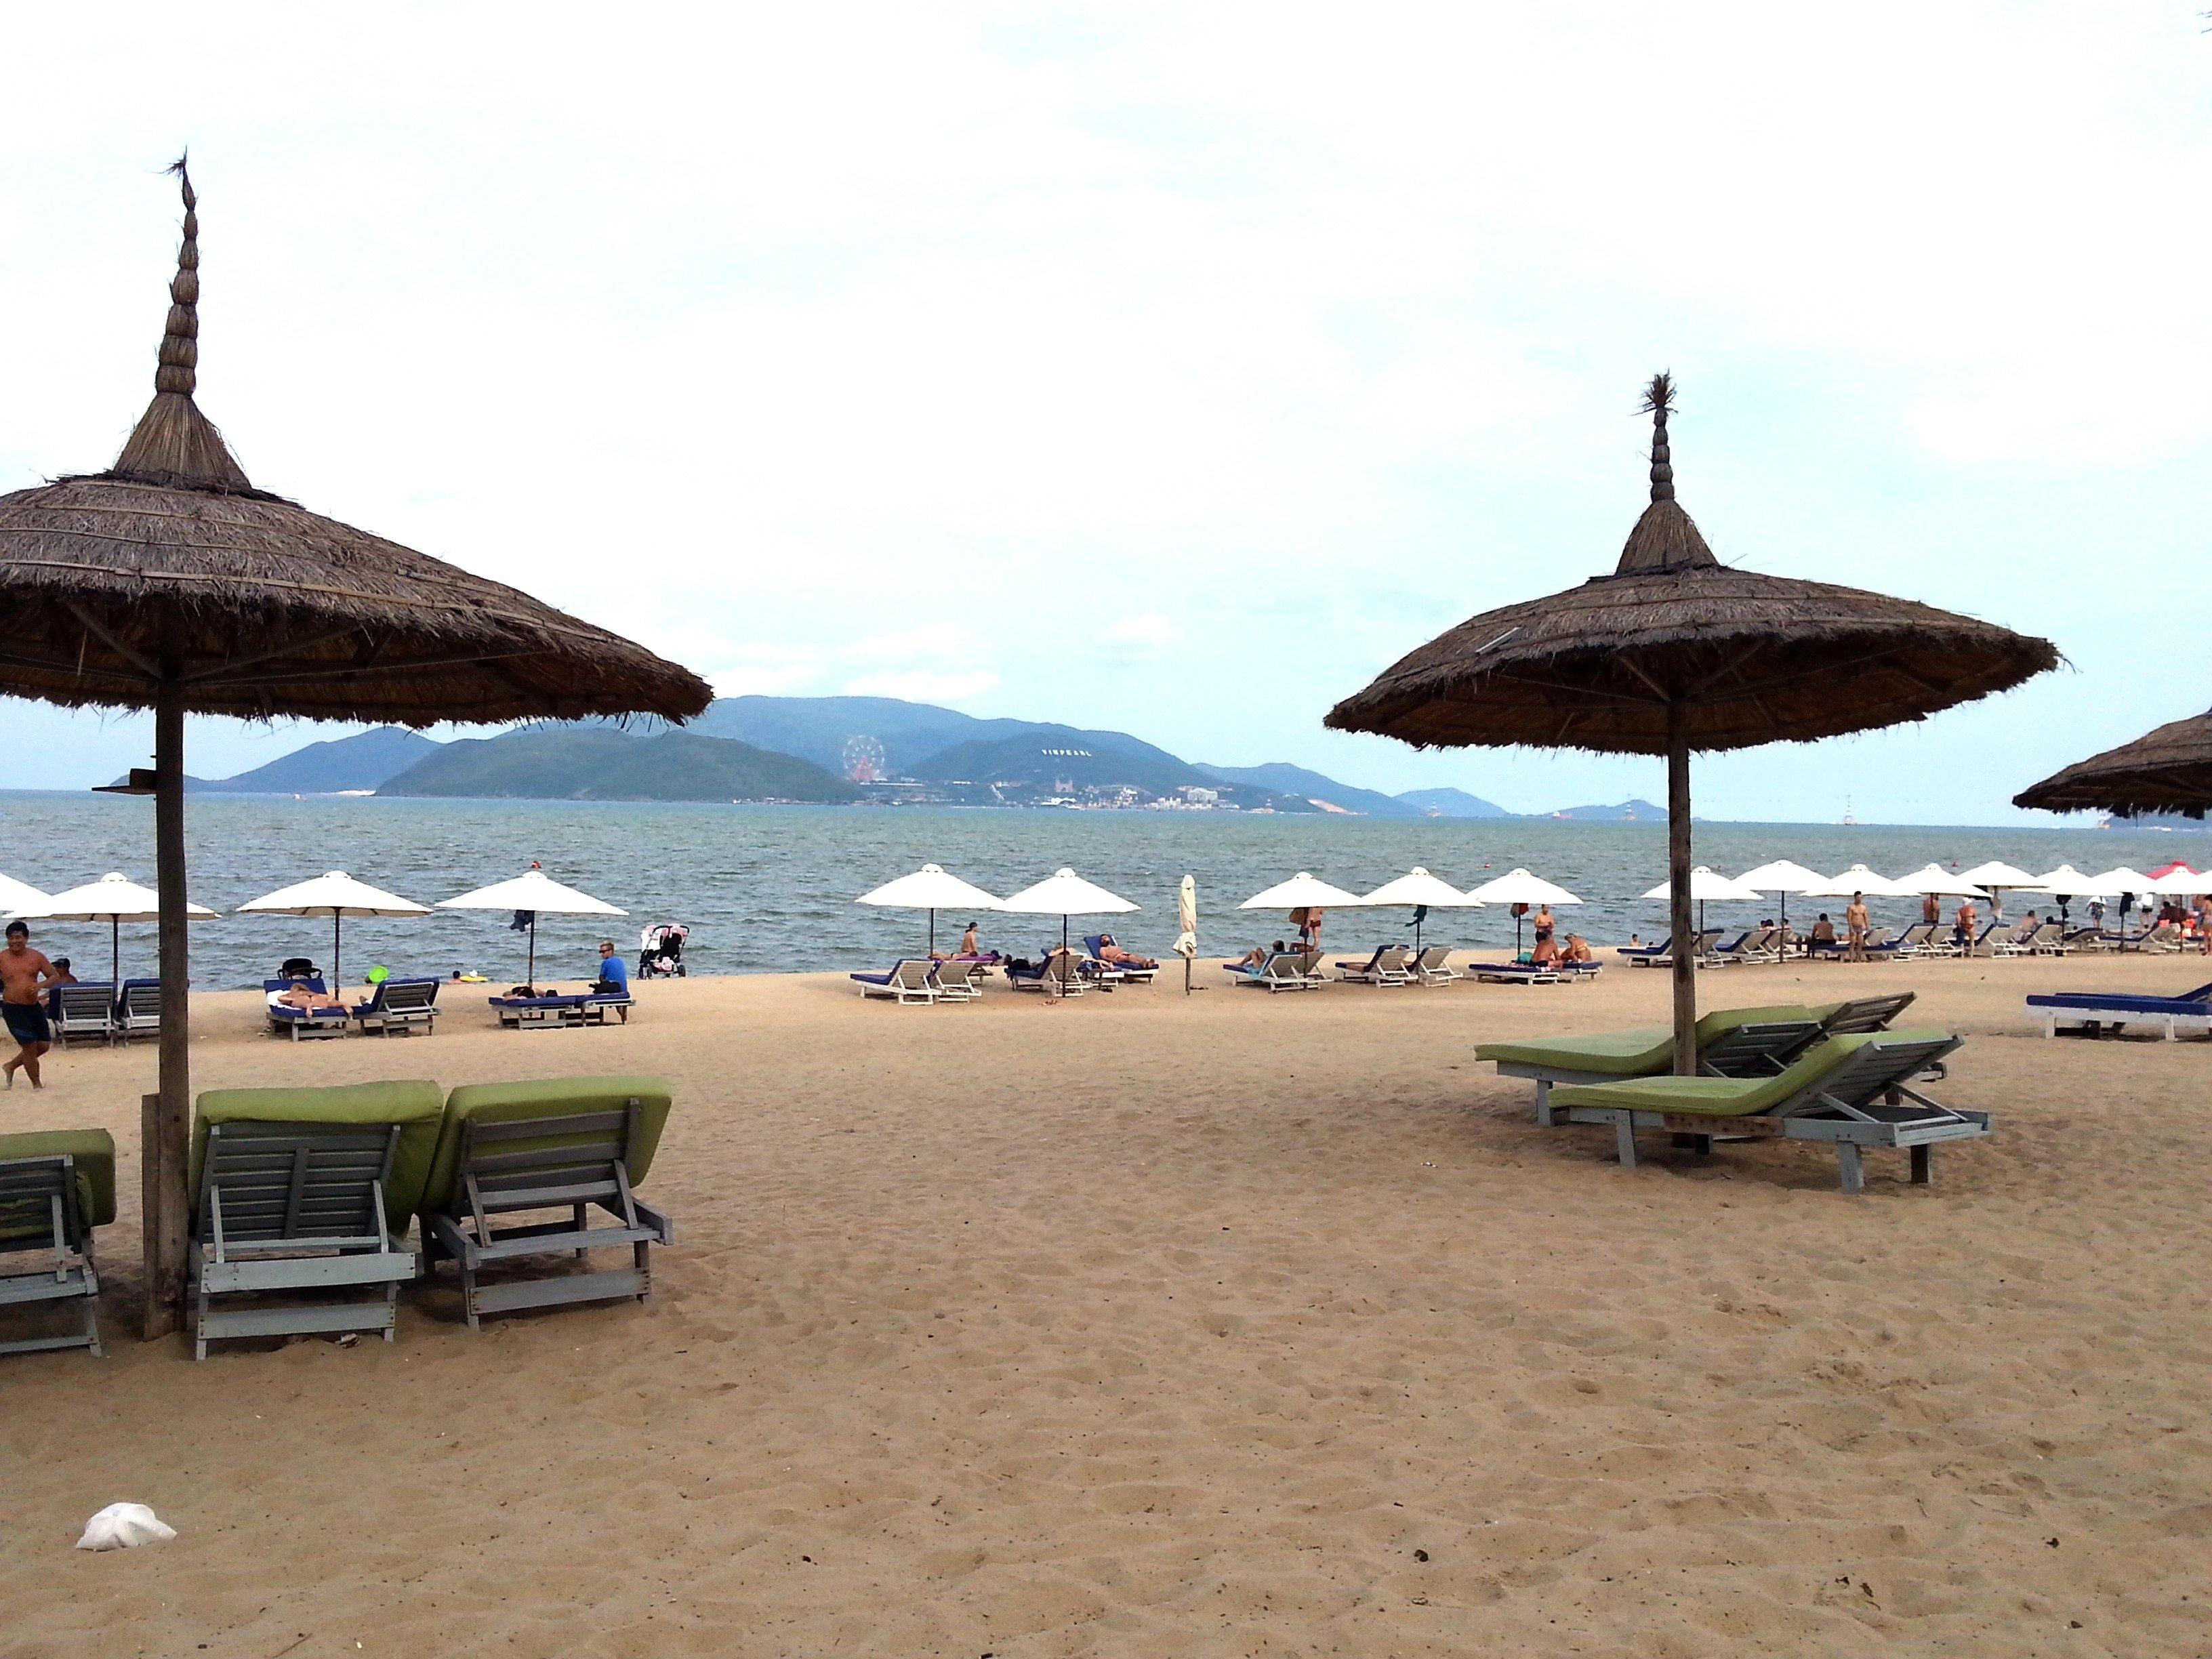 Sunbeds for rent on Nha Trang Beach